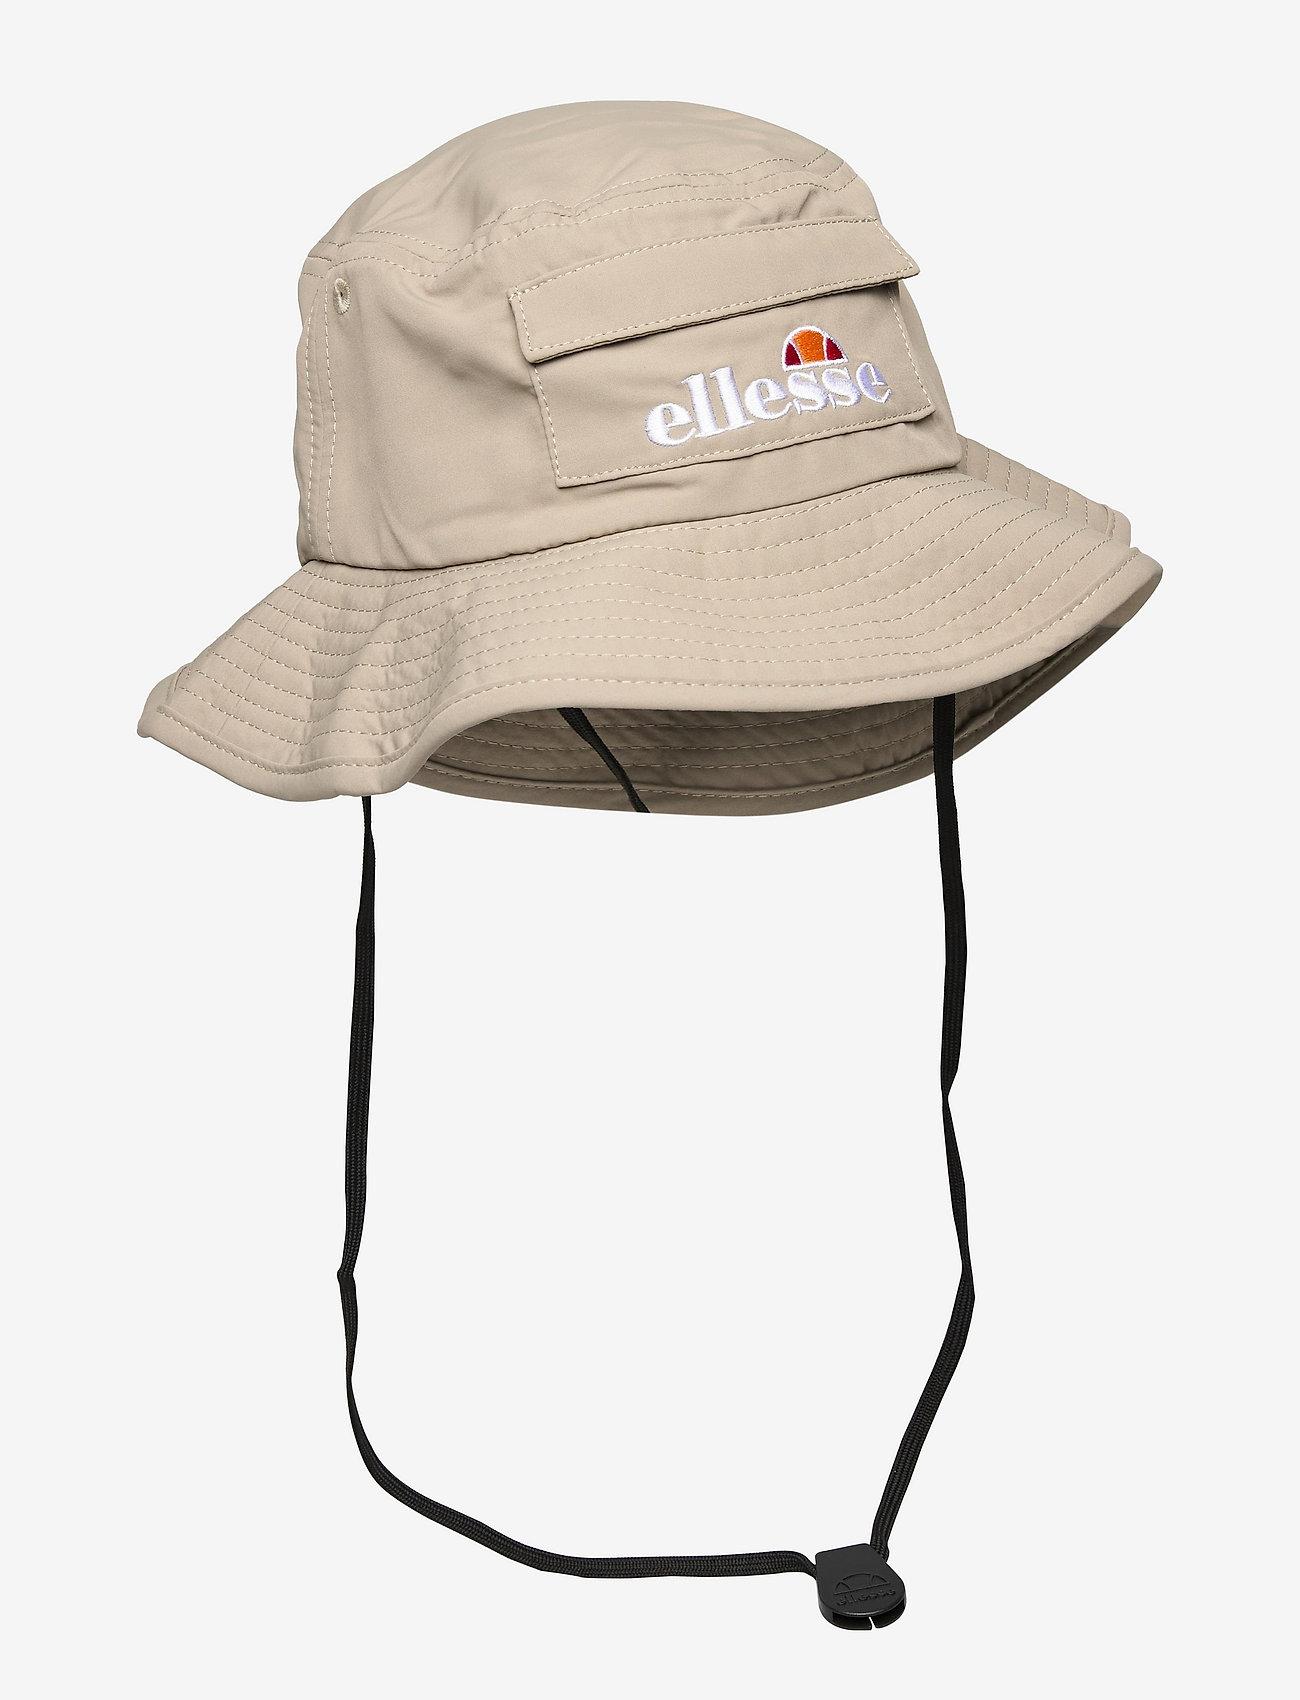 Ellesse - EL SOLLI BUCKET HAT - bucket hats - khaki - 0